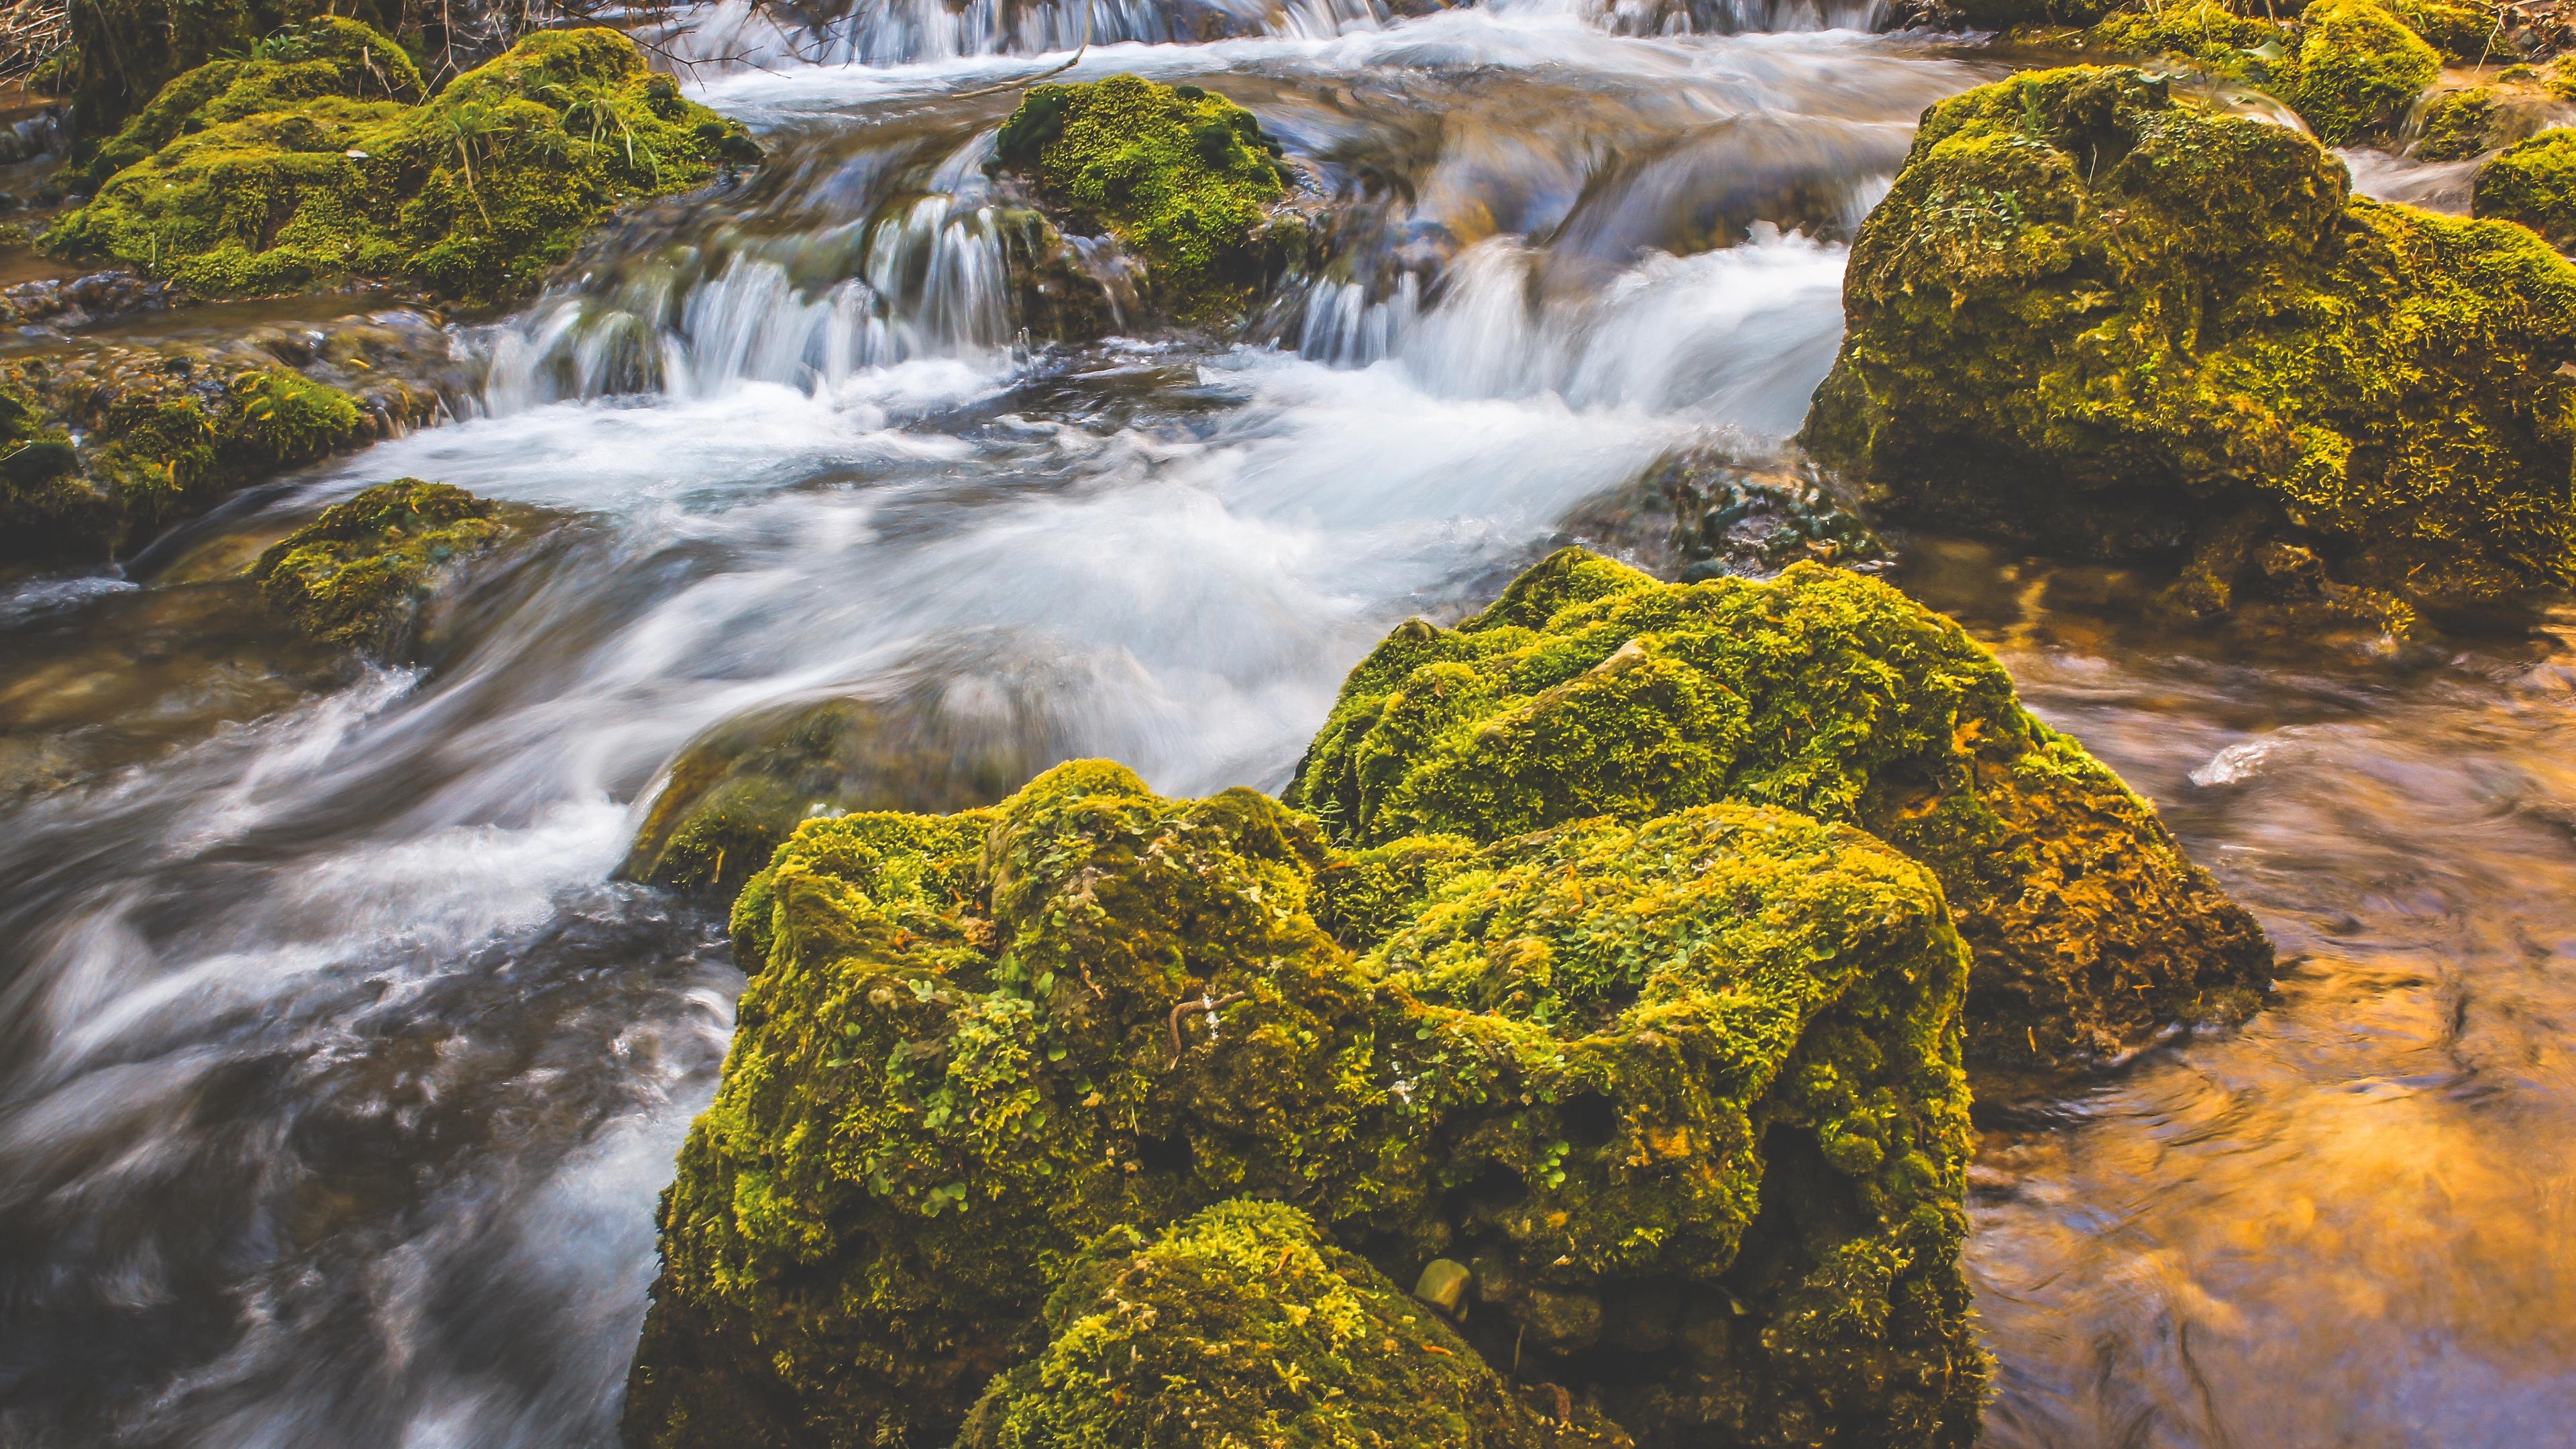 waterfall moss stones flow 4k 1541116573 - waterfall, moss, stones, flow 4k - Waterfall, Stones, moss